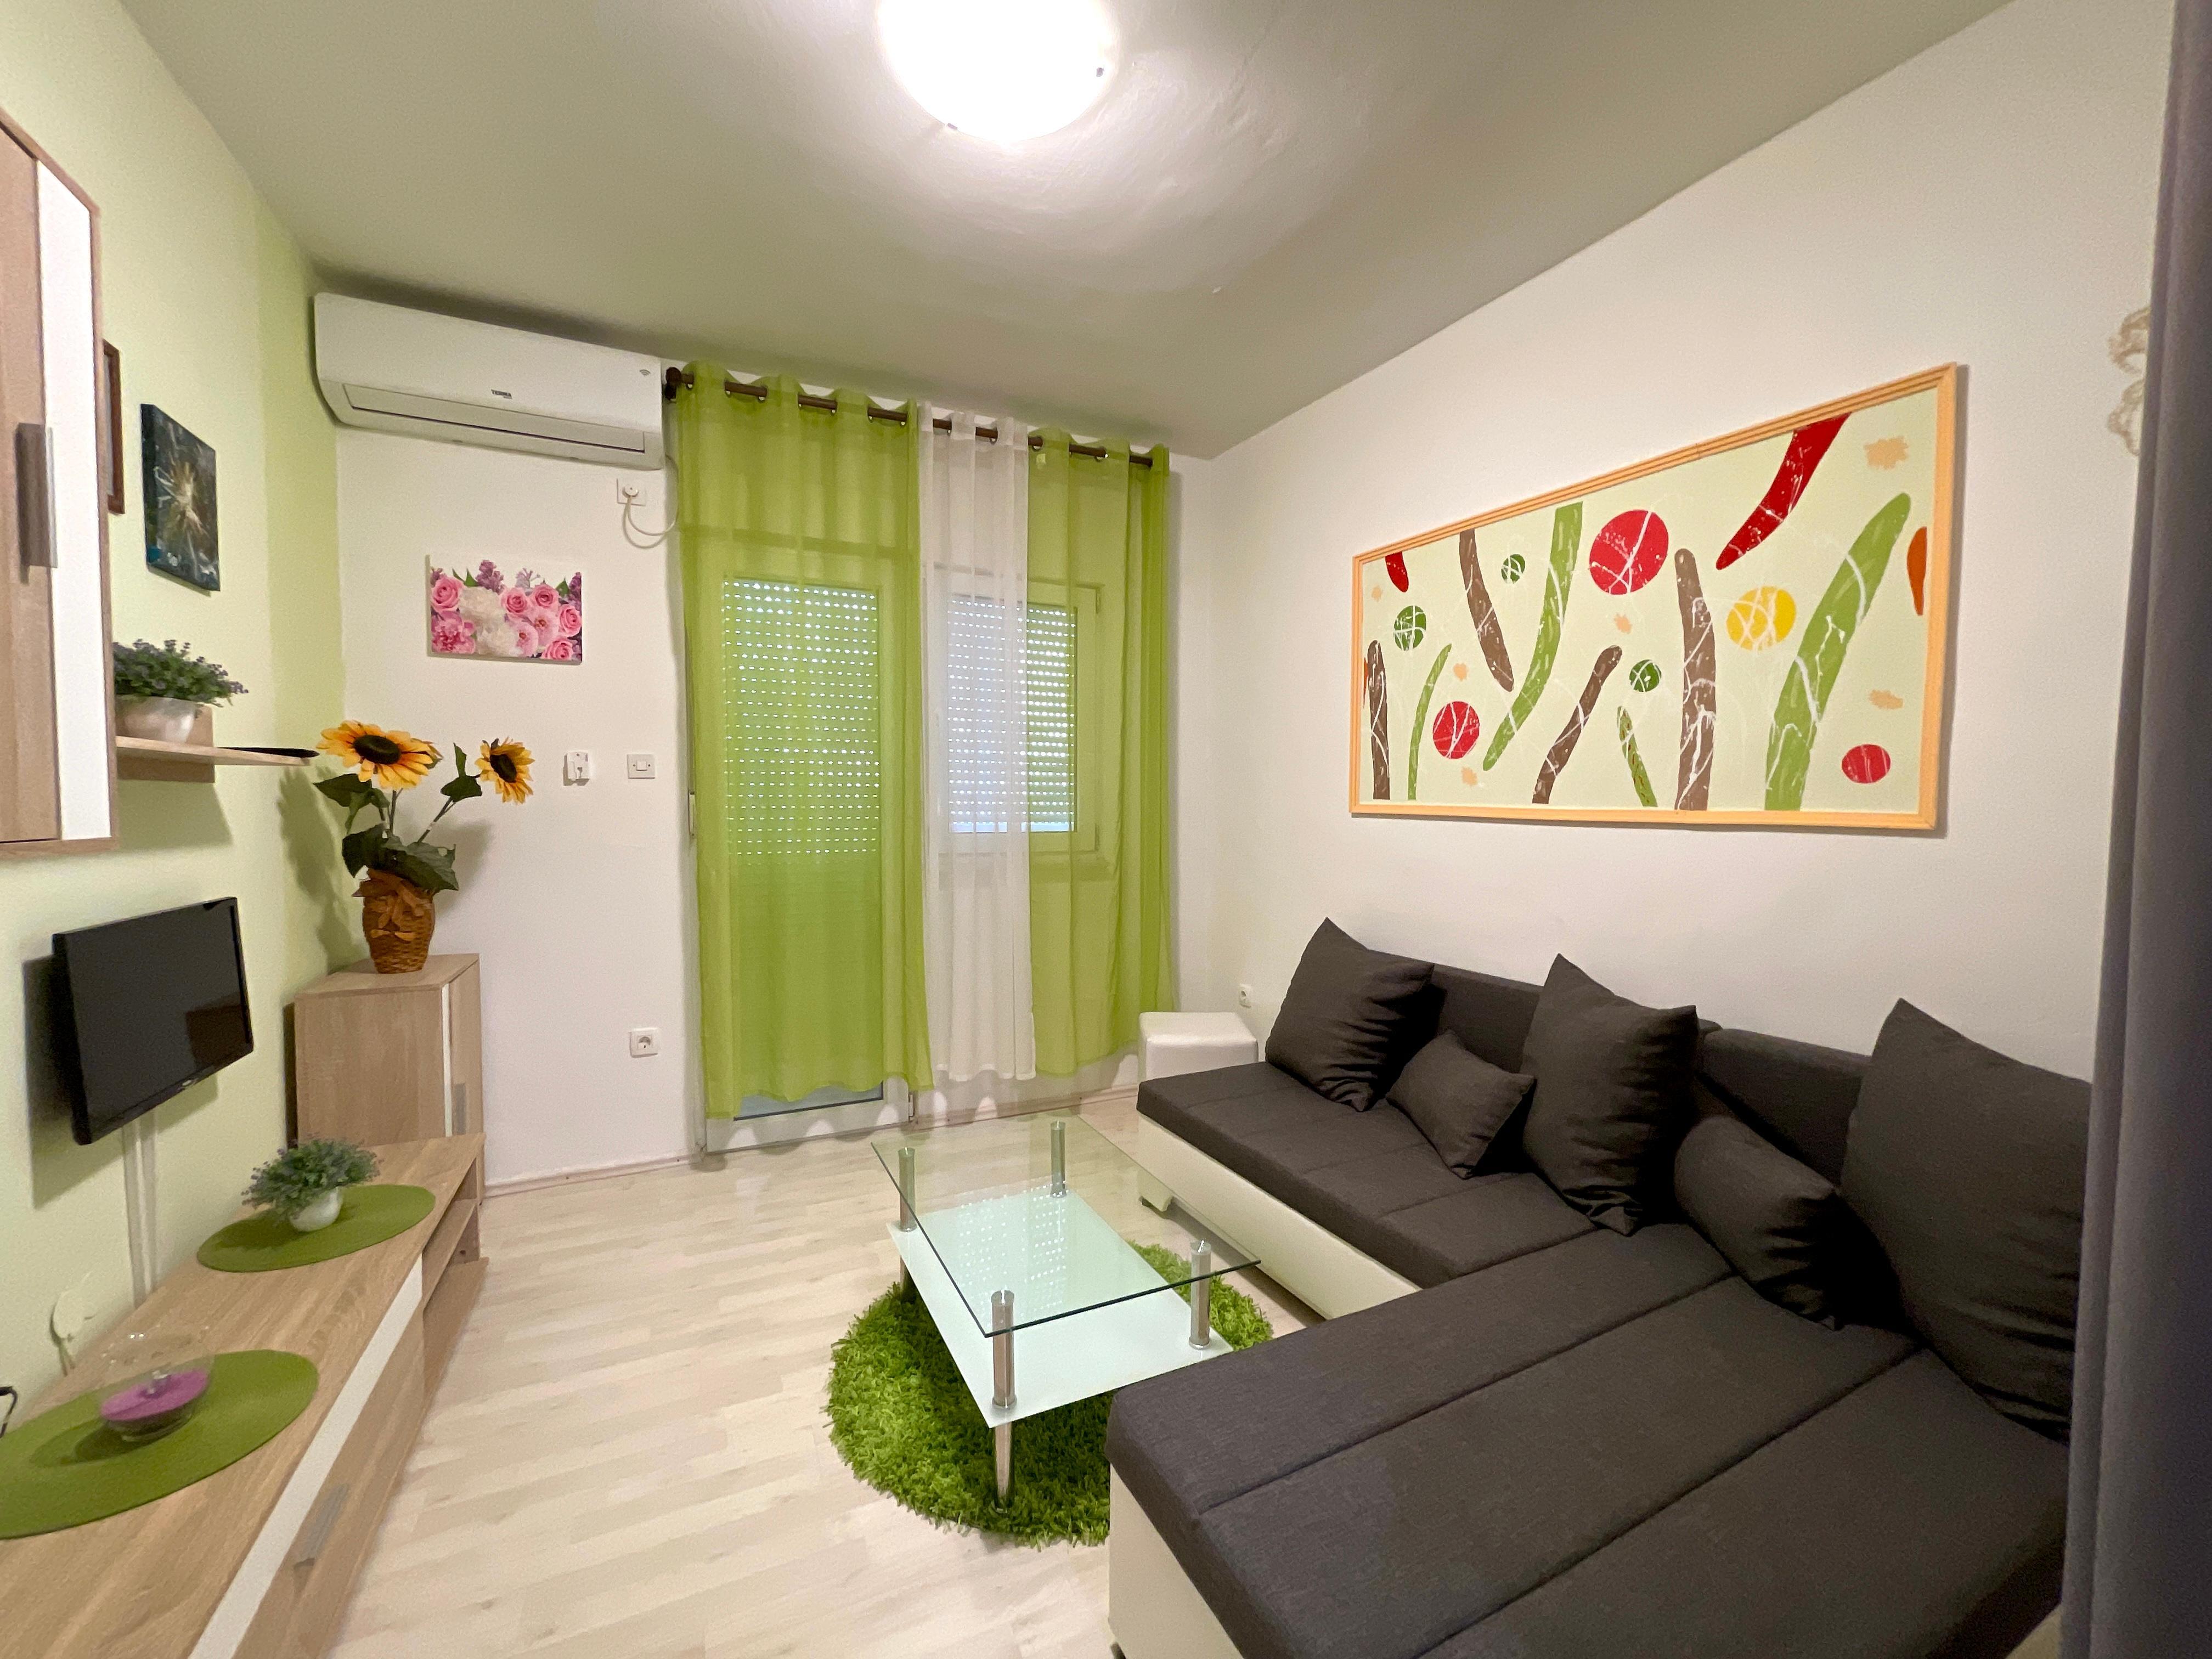 eg app f r 2 4 pers 40 m wohnfl che haustiere. Black Bedroom Furniture Sets. Home Design Ideas